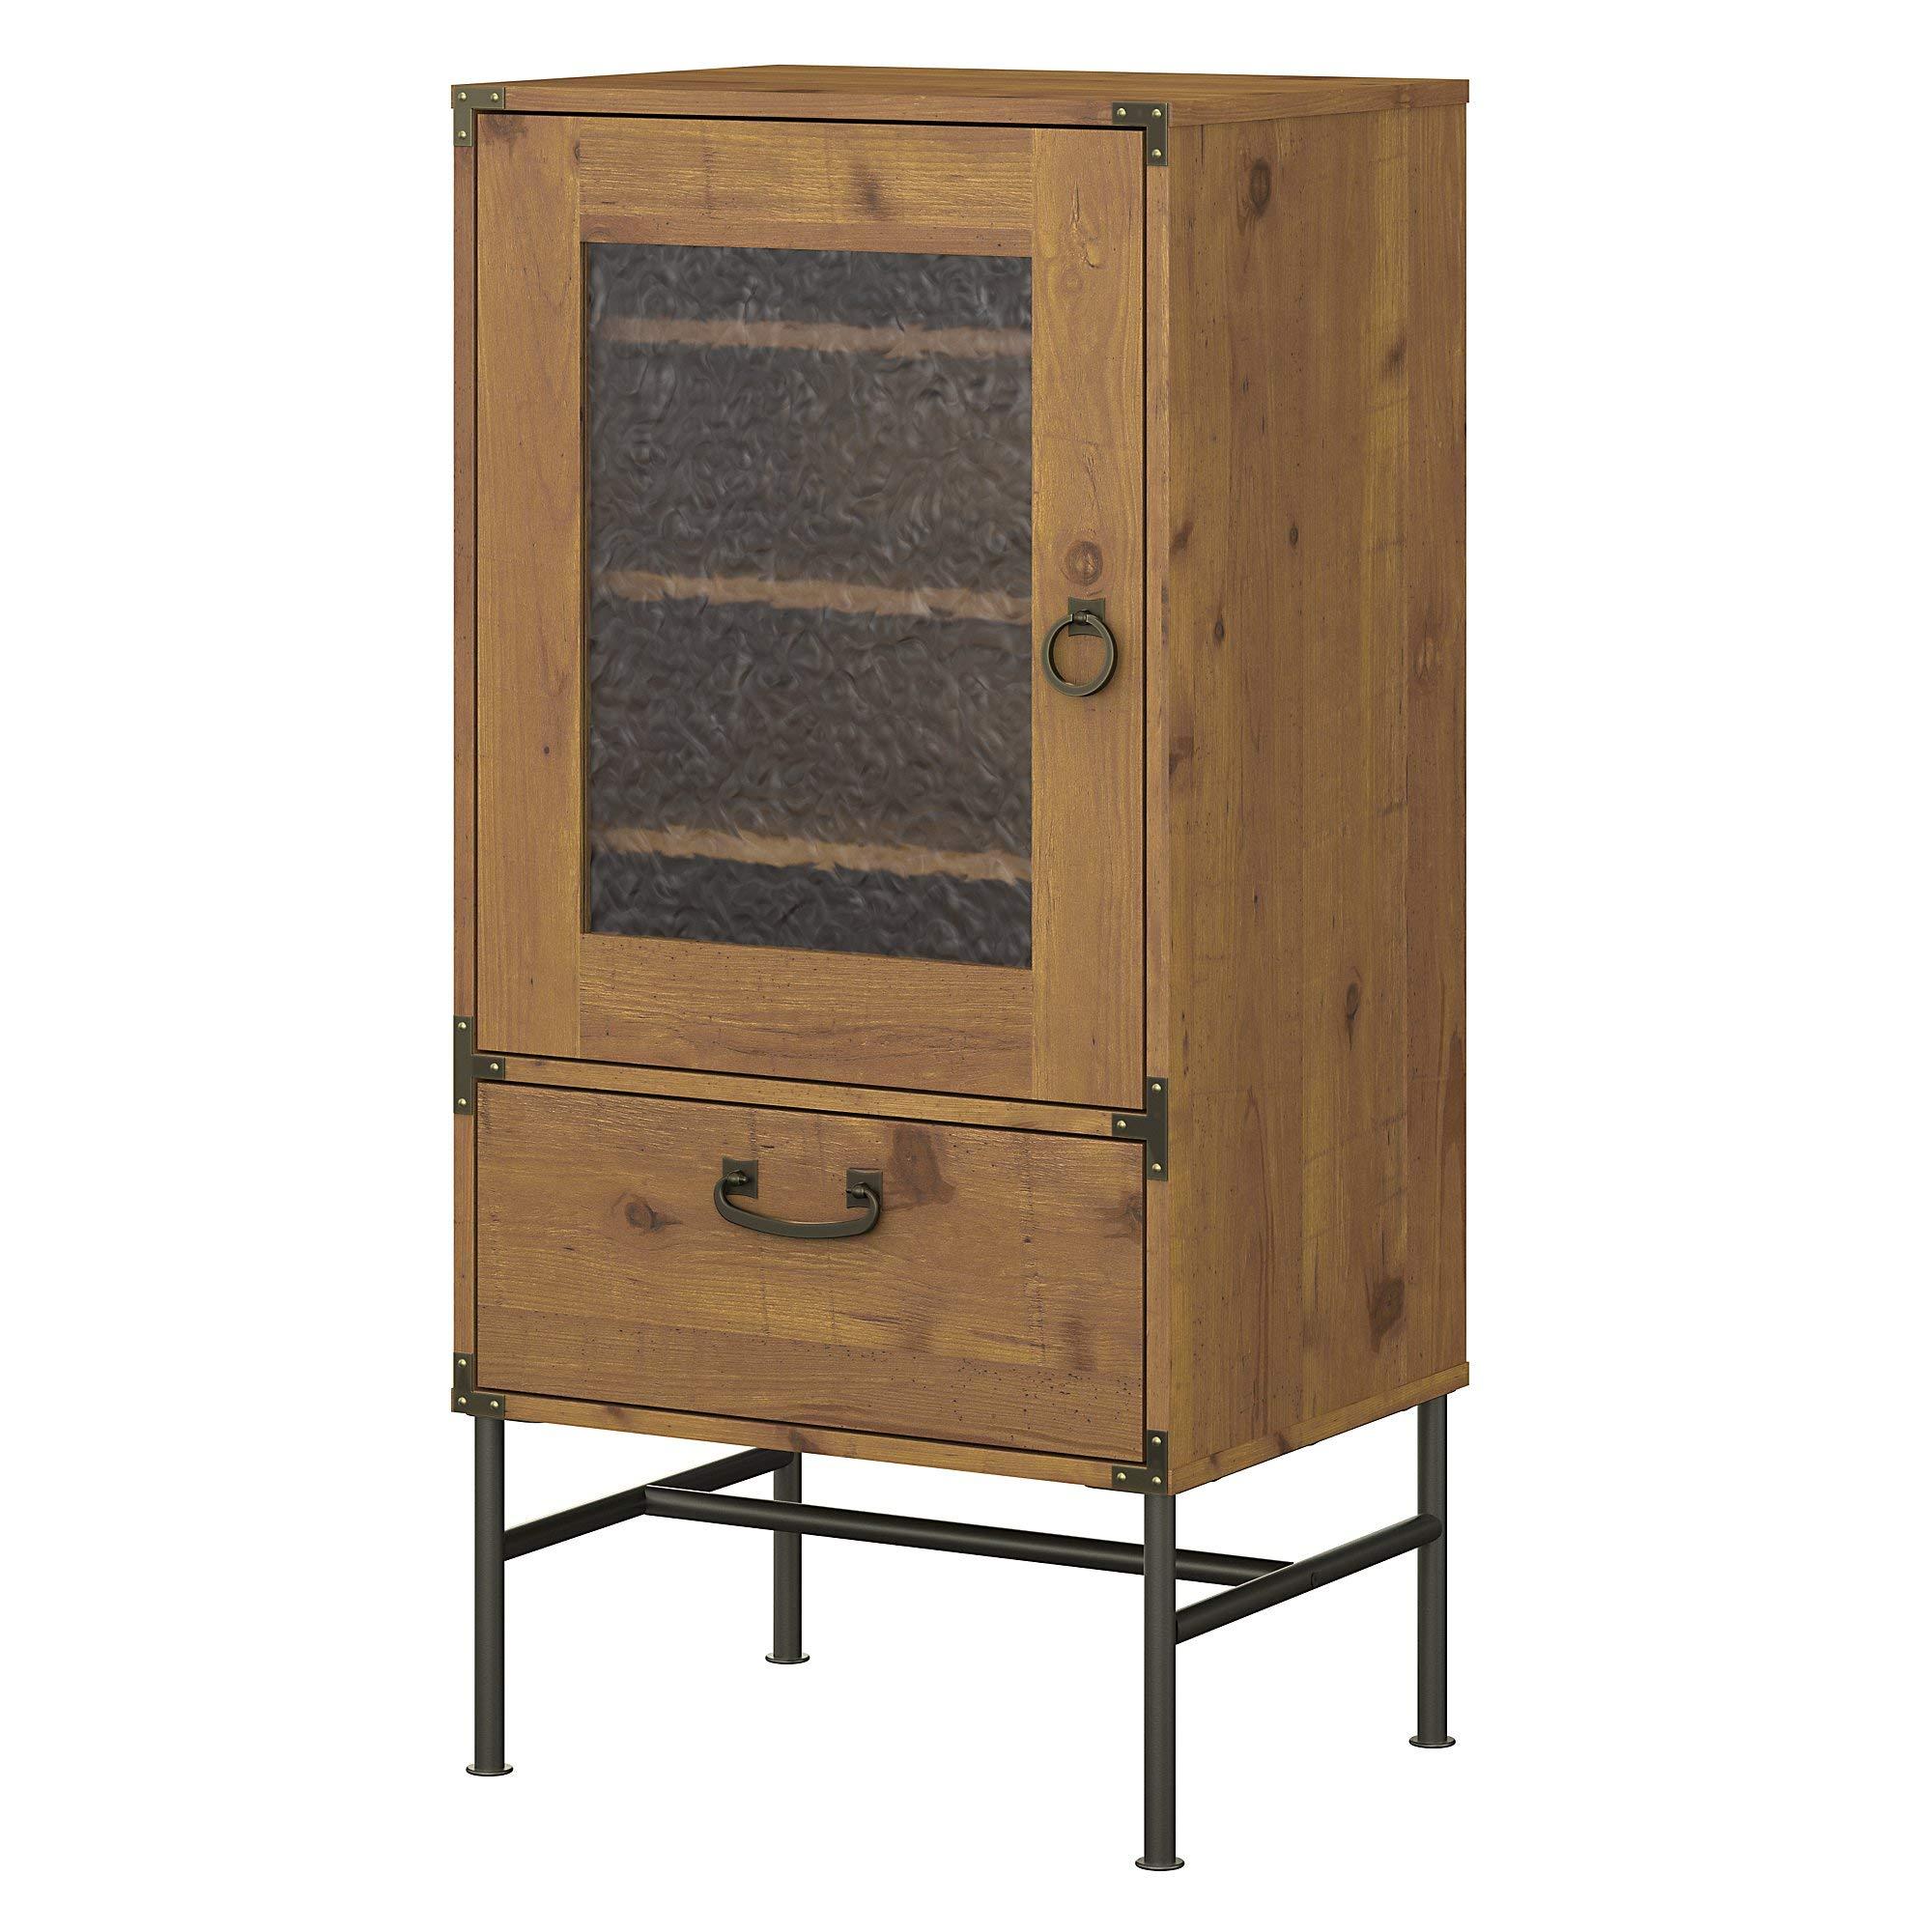 kathy ireland Home by Bush Furniture Ironworks Audio Storage Cabinet in Vintage Golden Pine by kathy ireland Home by Bush Furniture